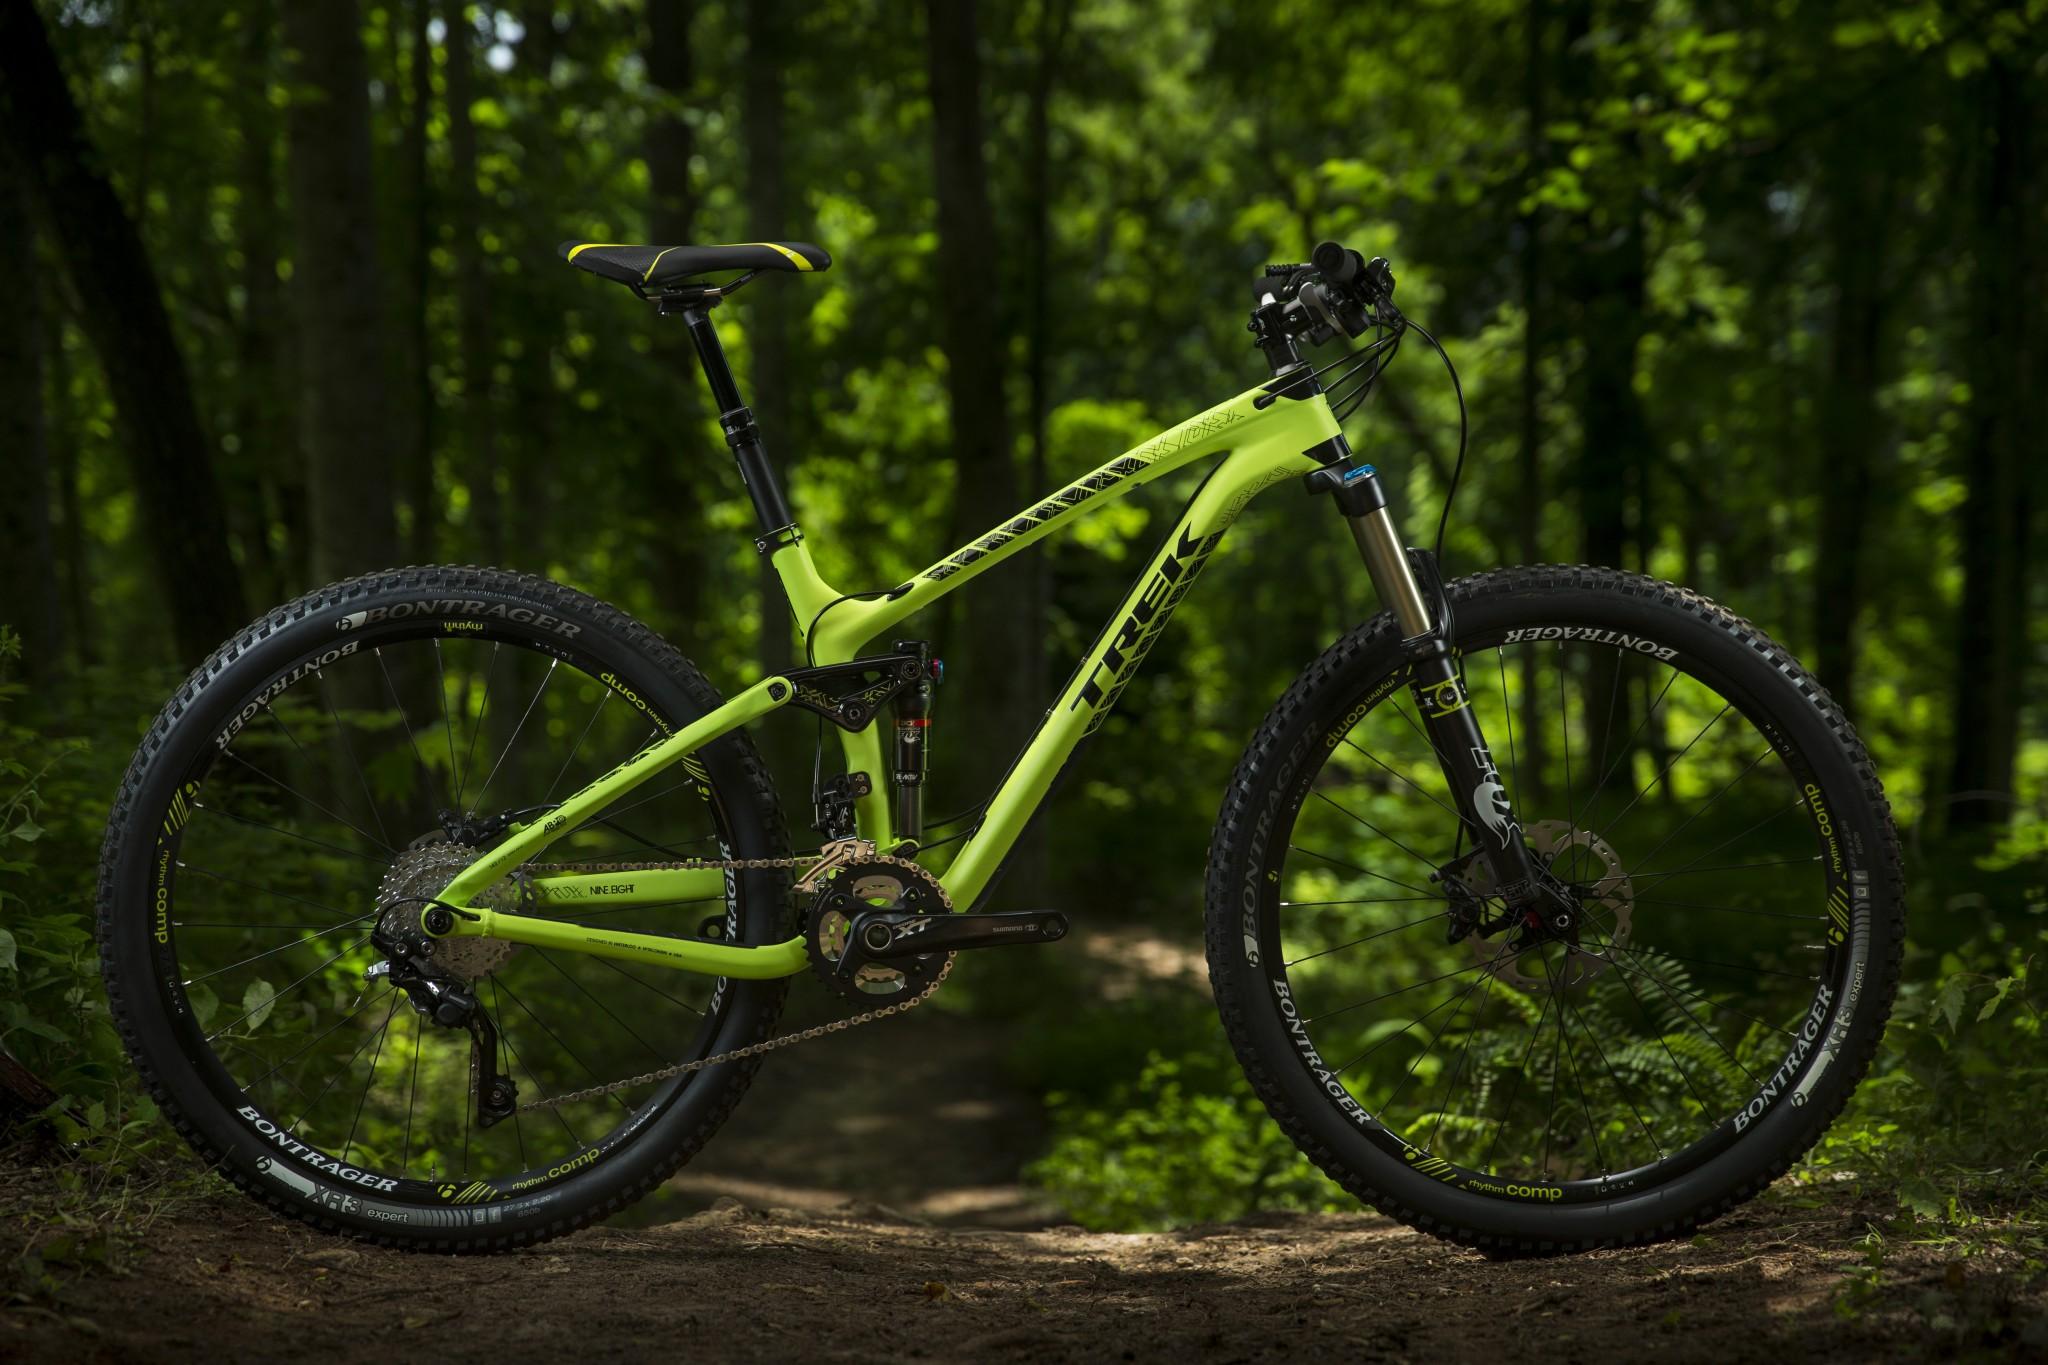 Trek Bikes Fuel Ex 9 8 2014 Mountain Bike Reviews